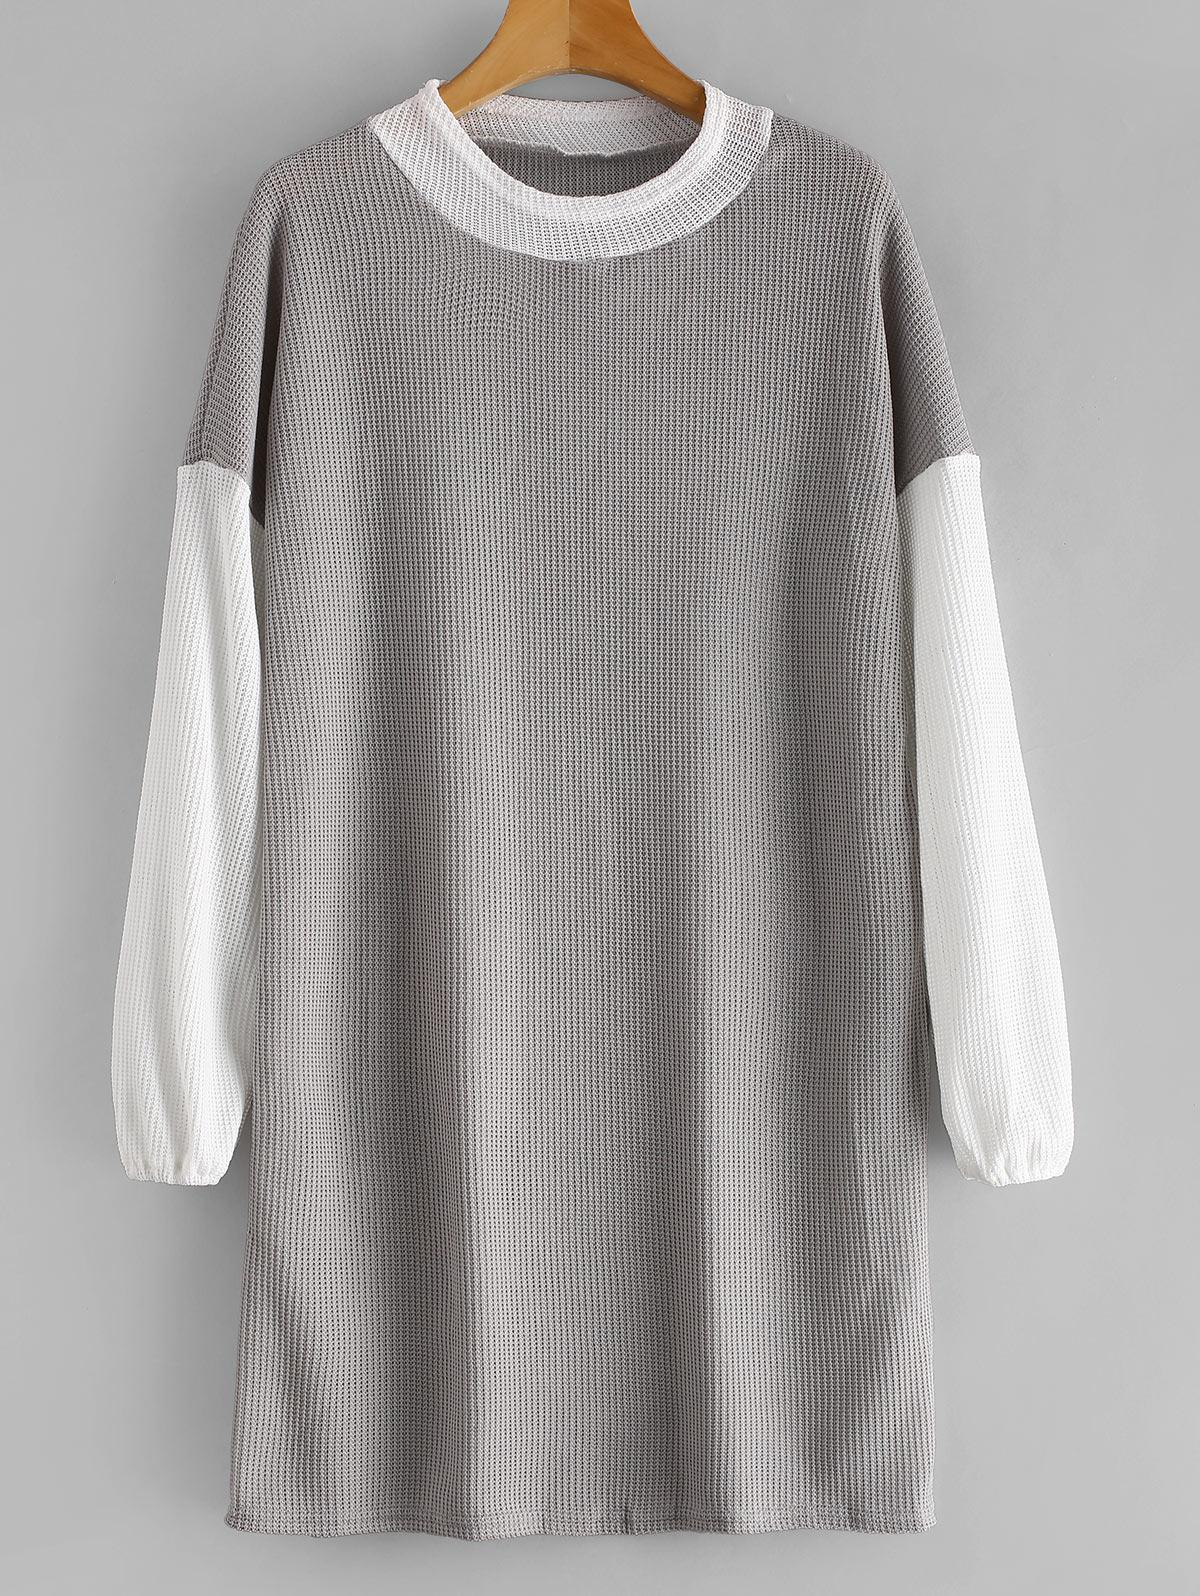 Long Sleeve Two Tone Sweater Dress